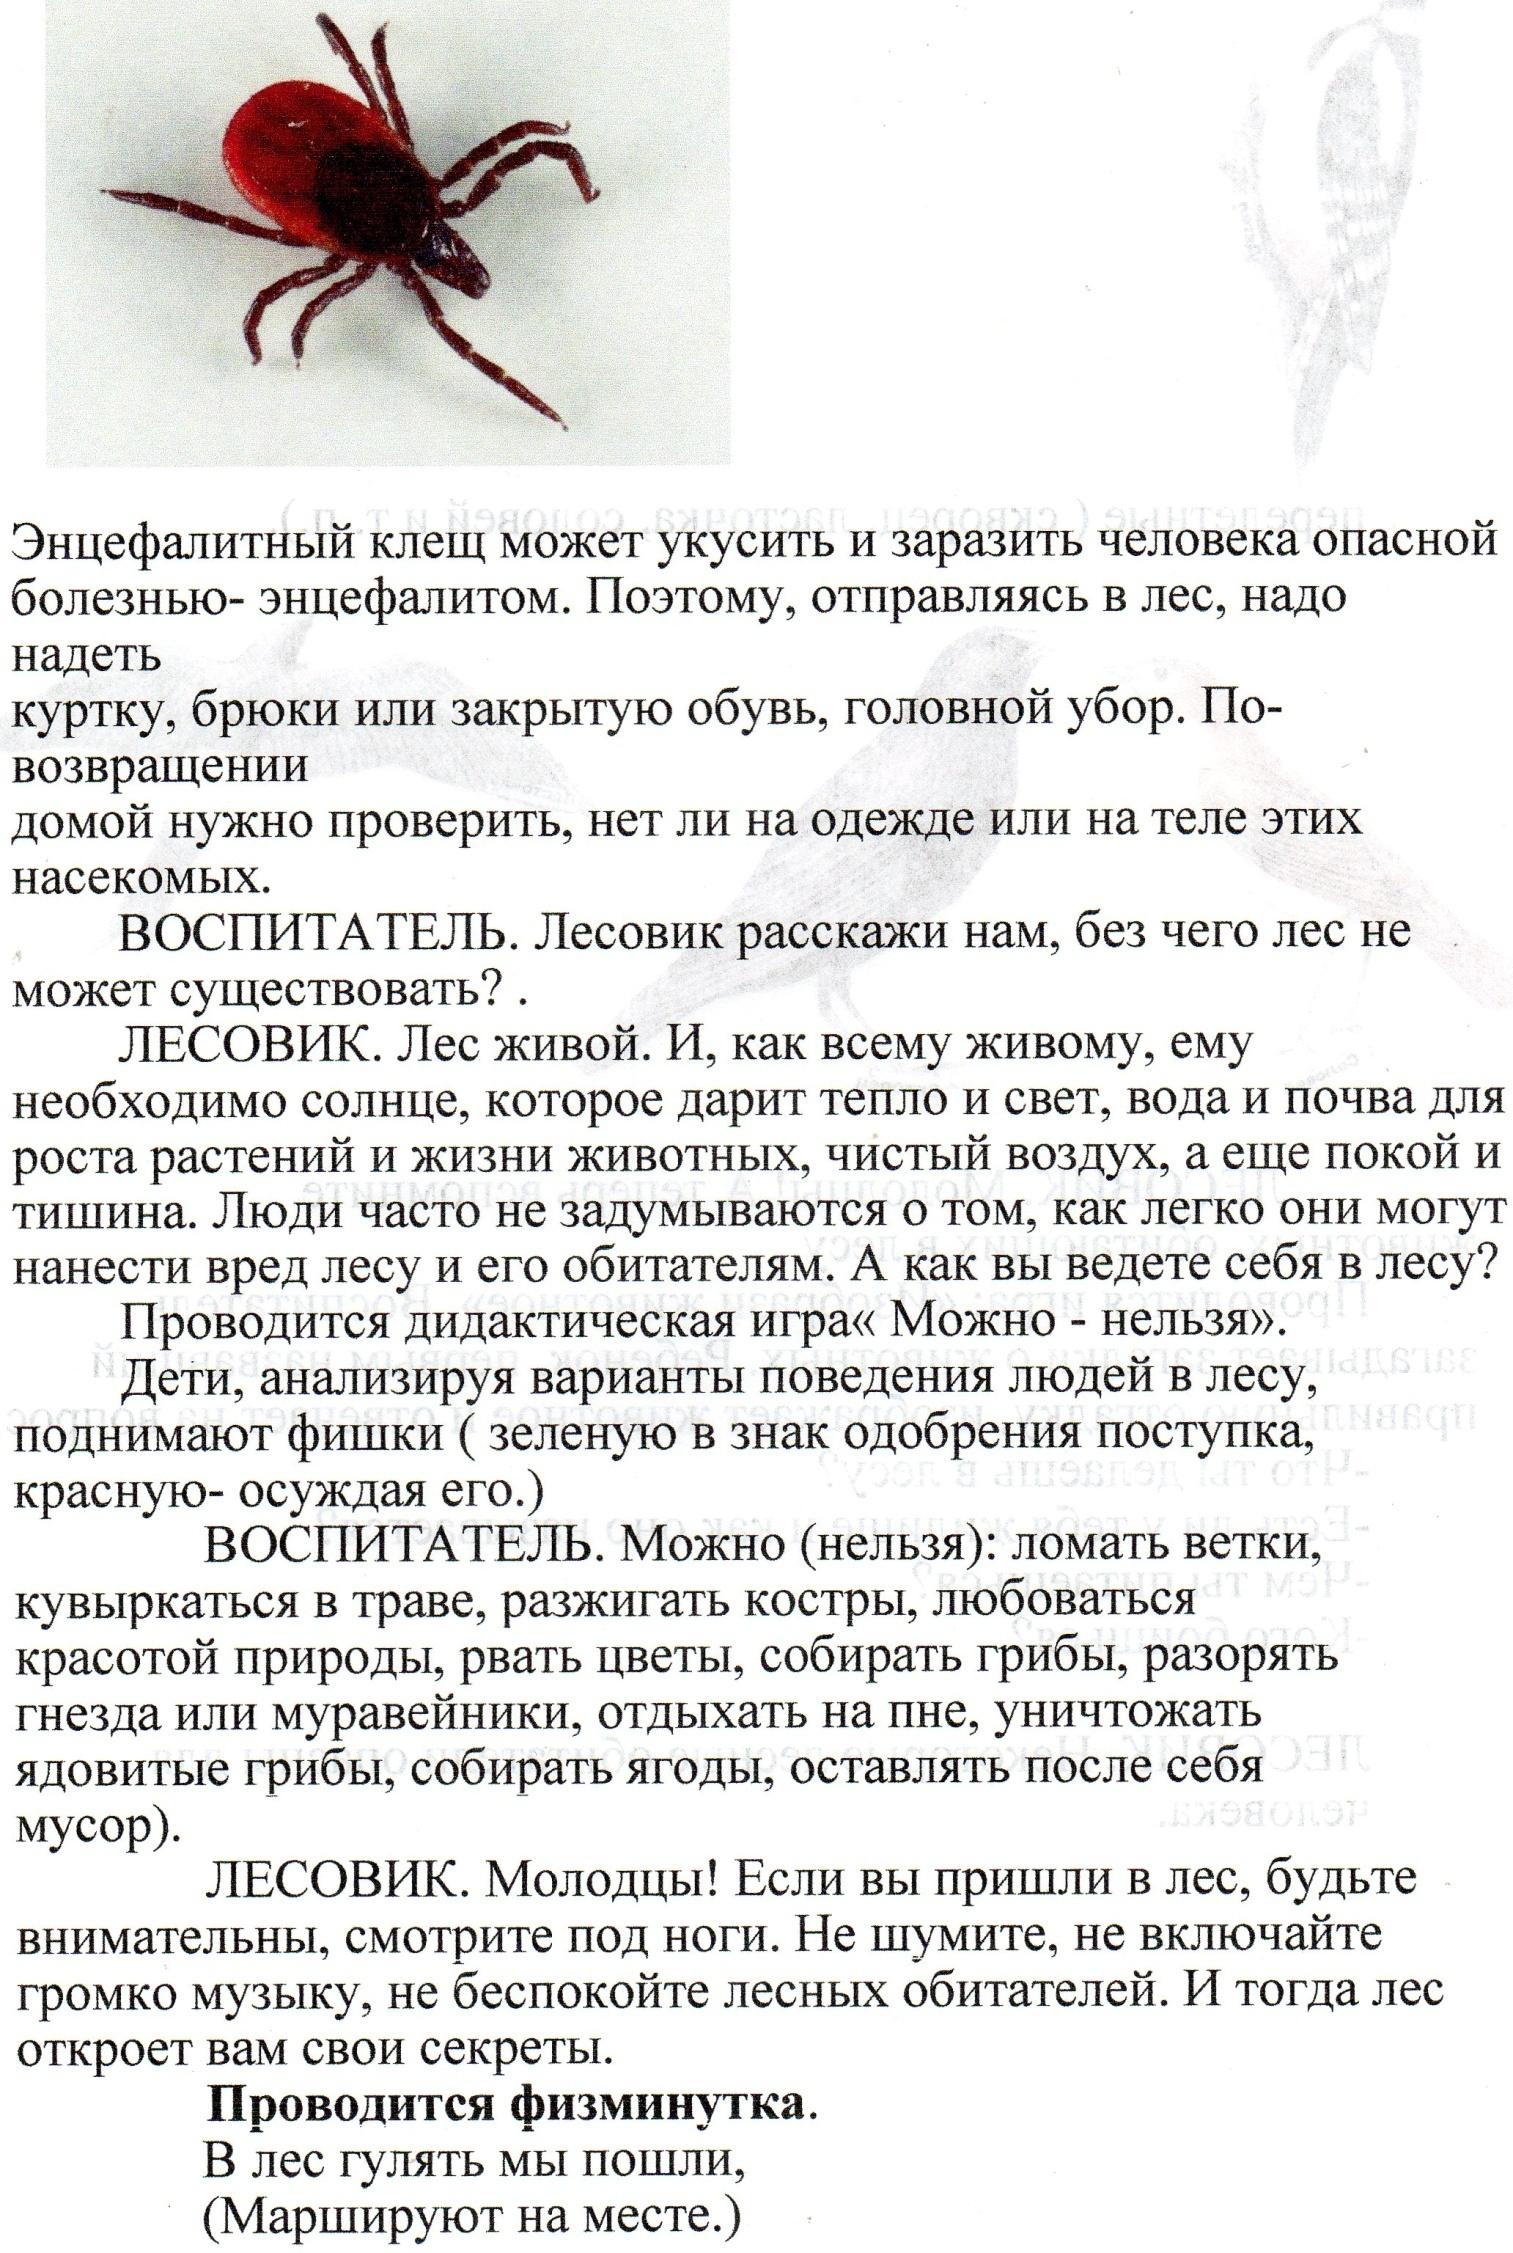 C:\Users\Александр\Pictures\img032.jpg